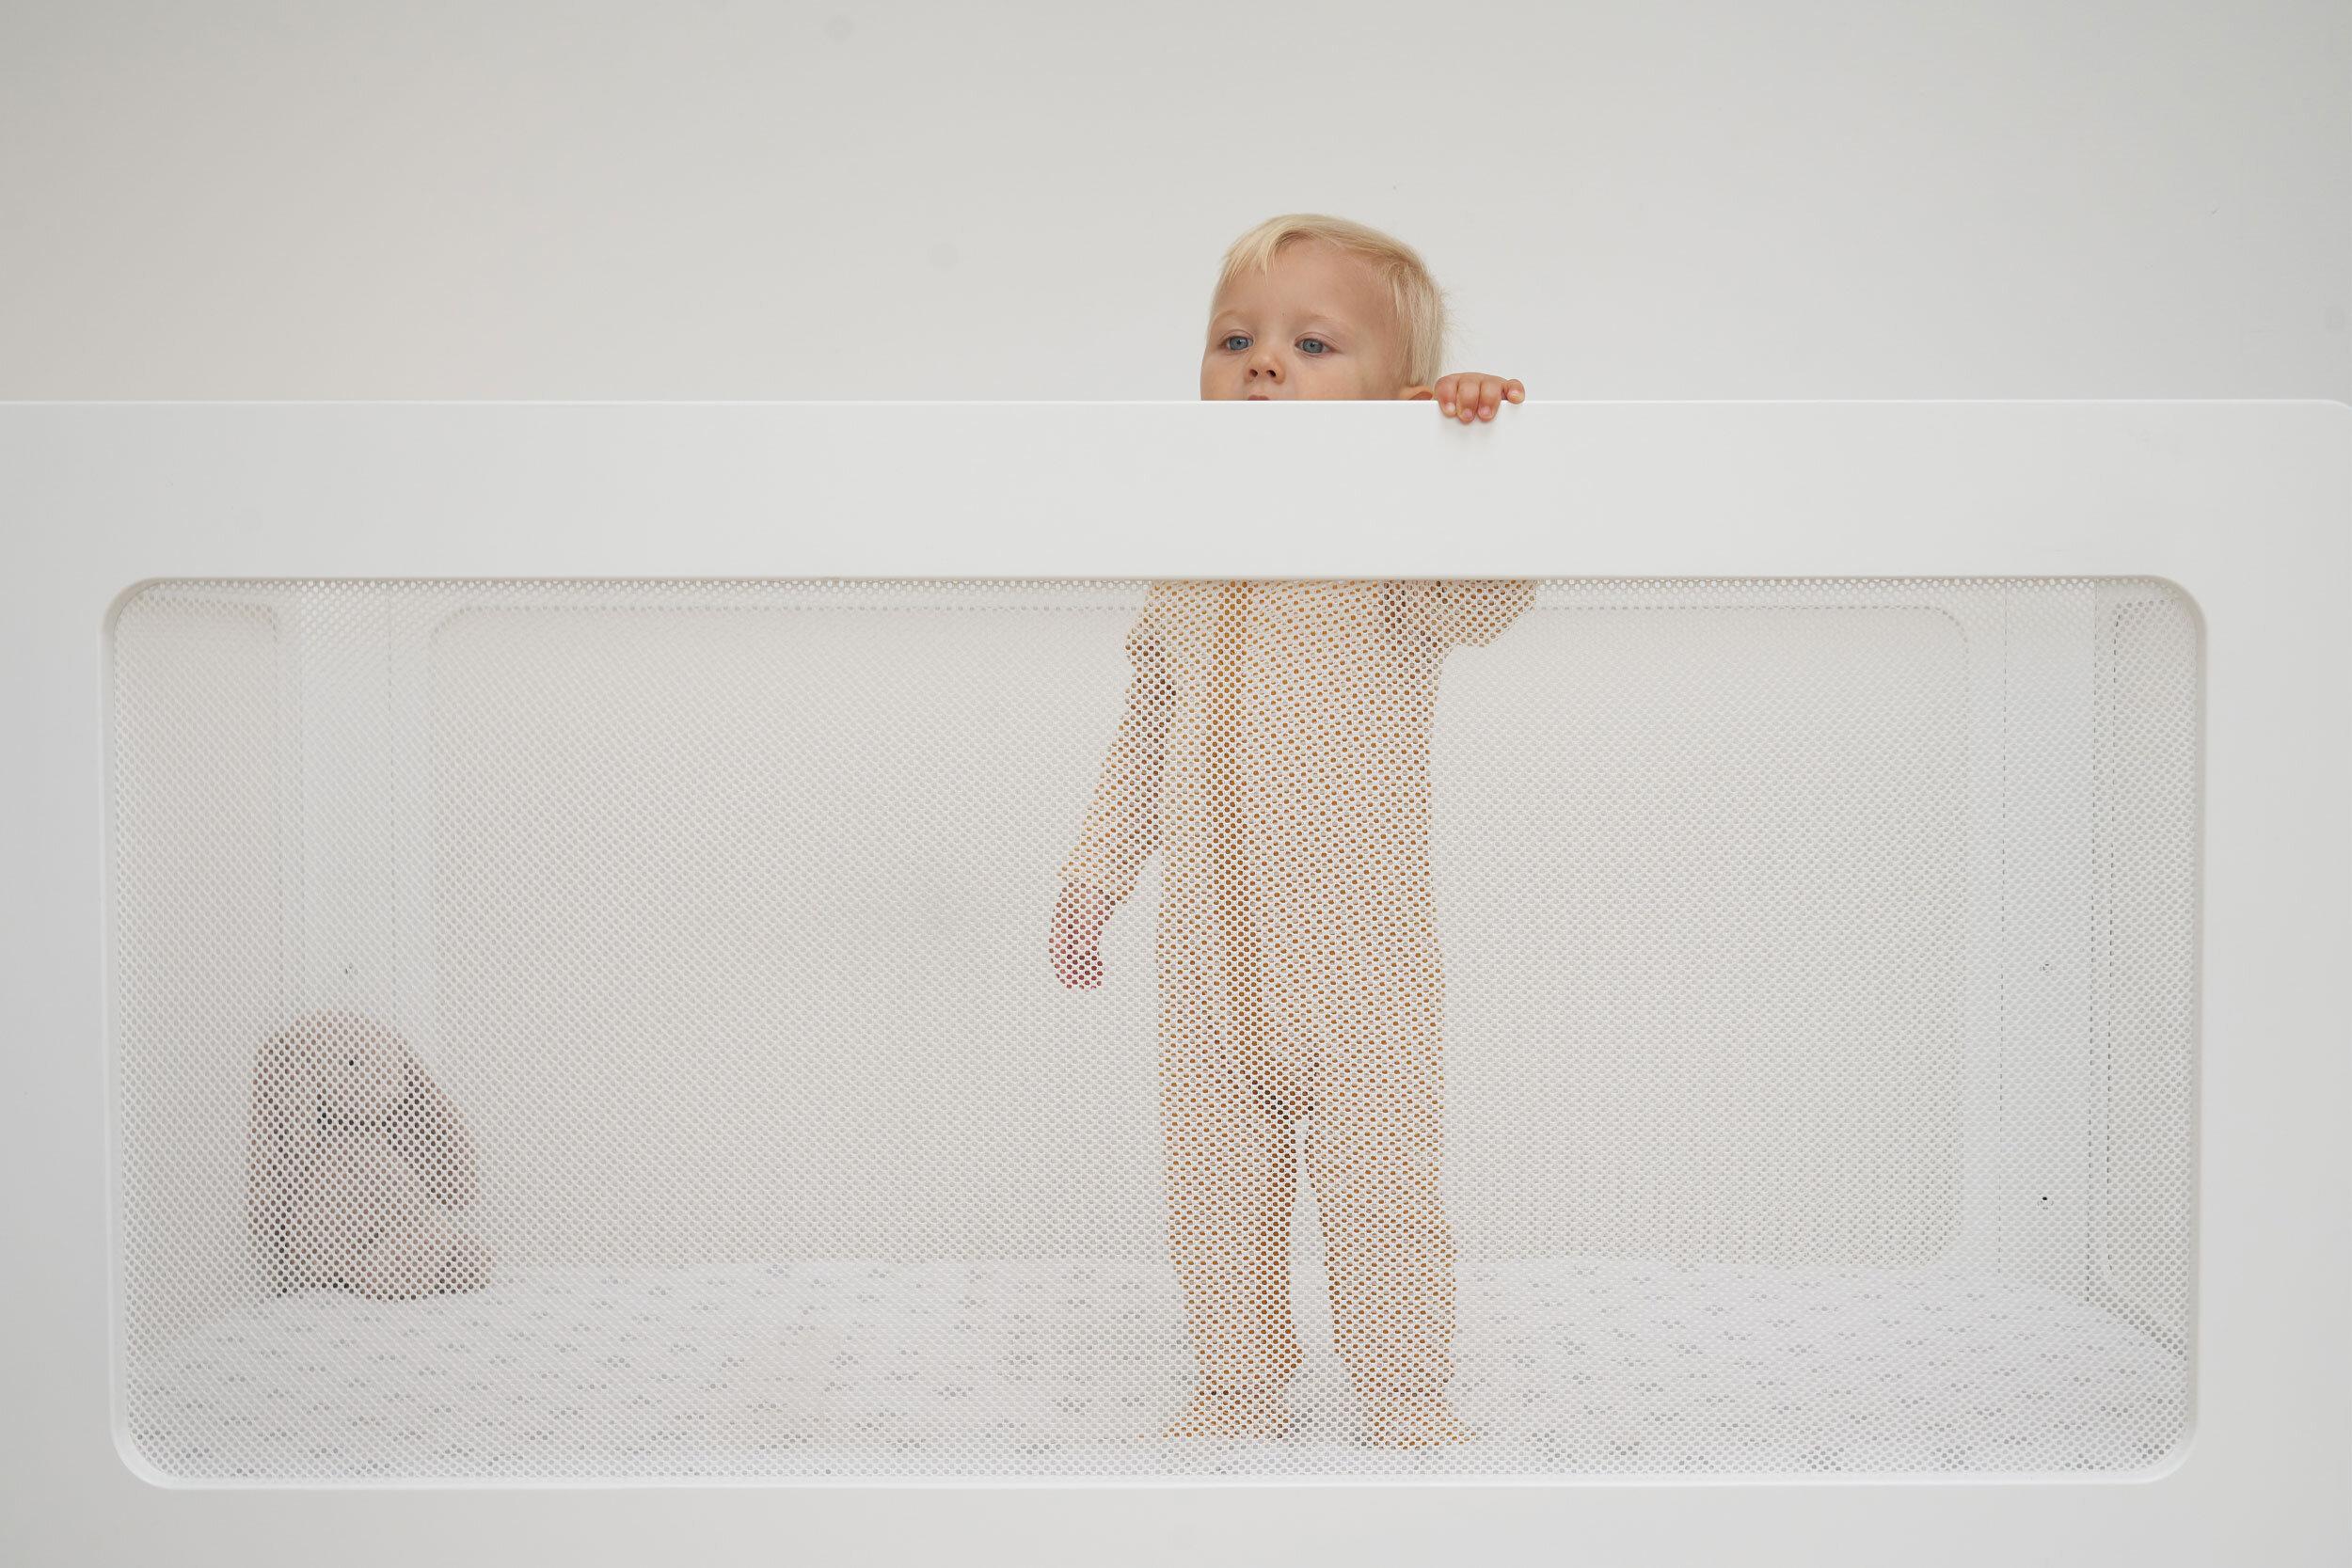 Fiona-Burrage-Little_Peep-Cot-Norfolk-Photographer-Mesh.jpg